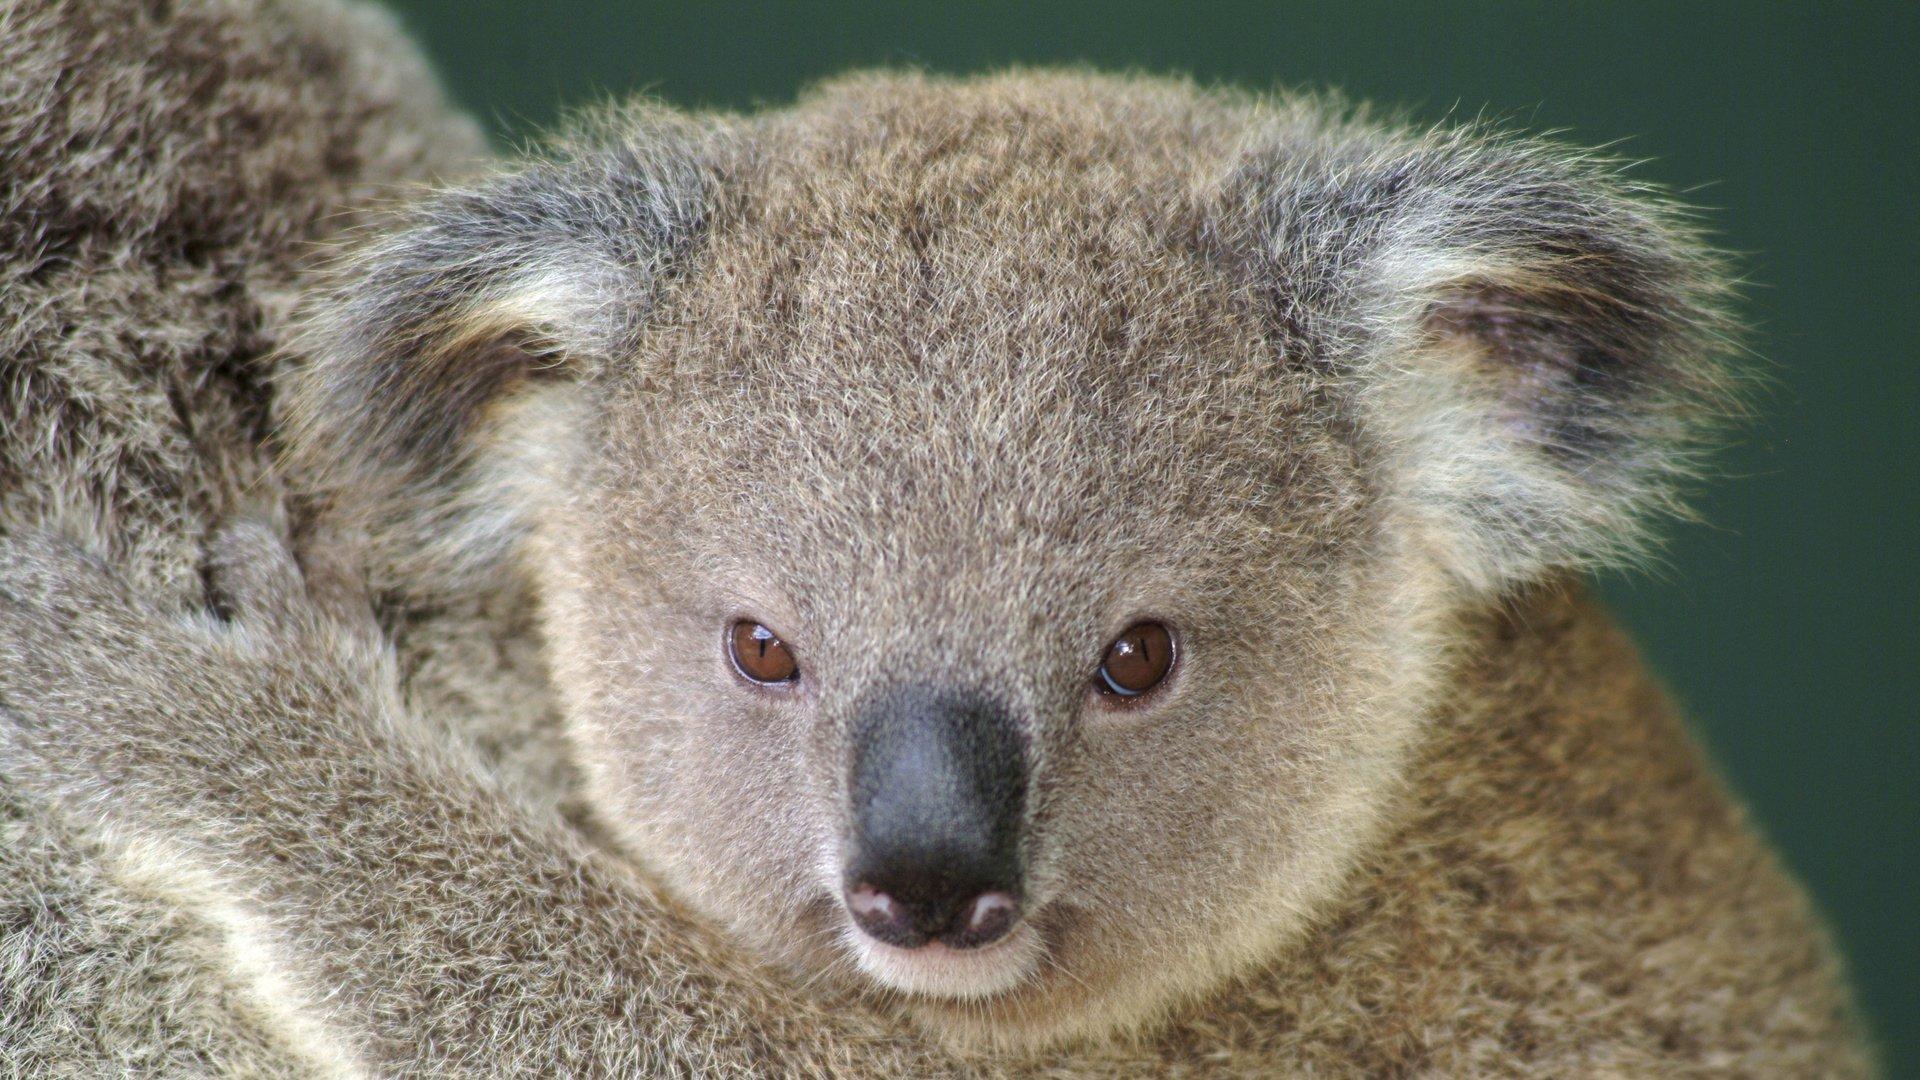 Koala Full Hd Wallpaper And Background 1920x1080 Id 431601